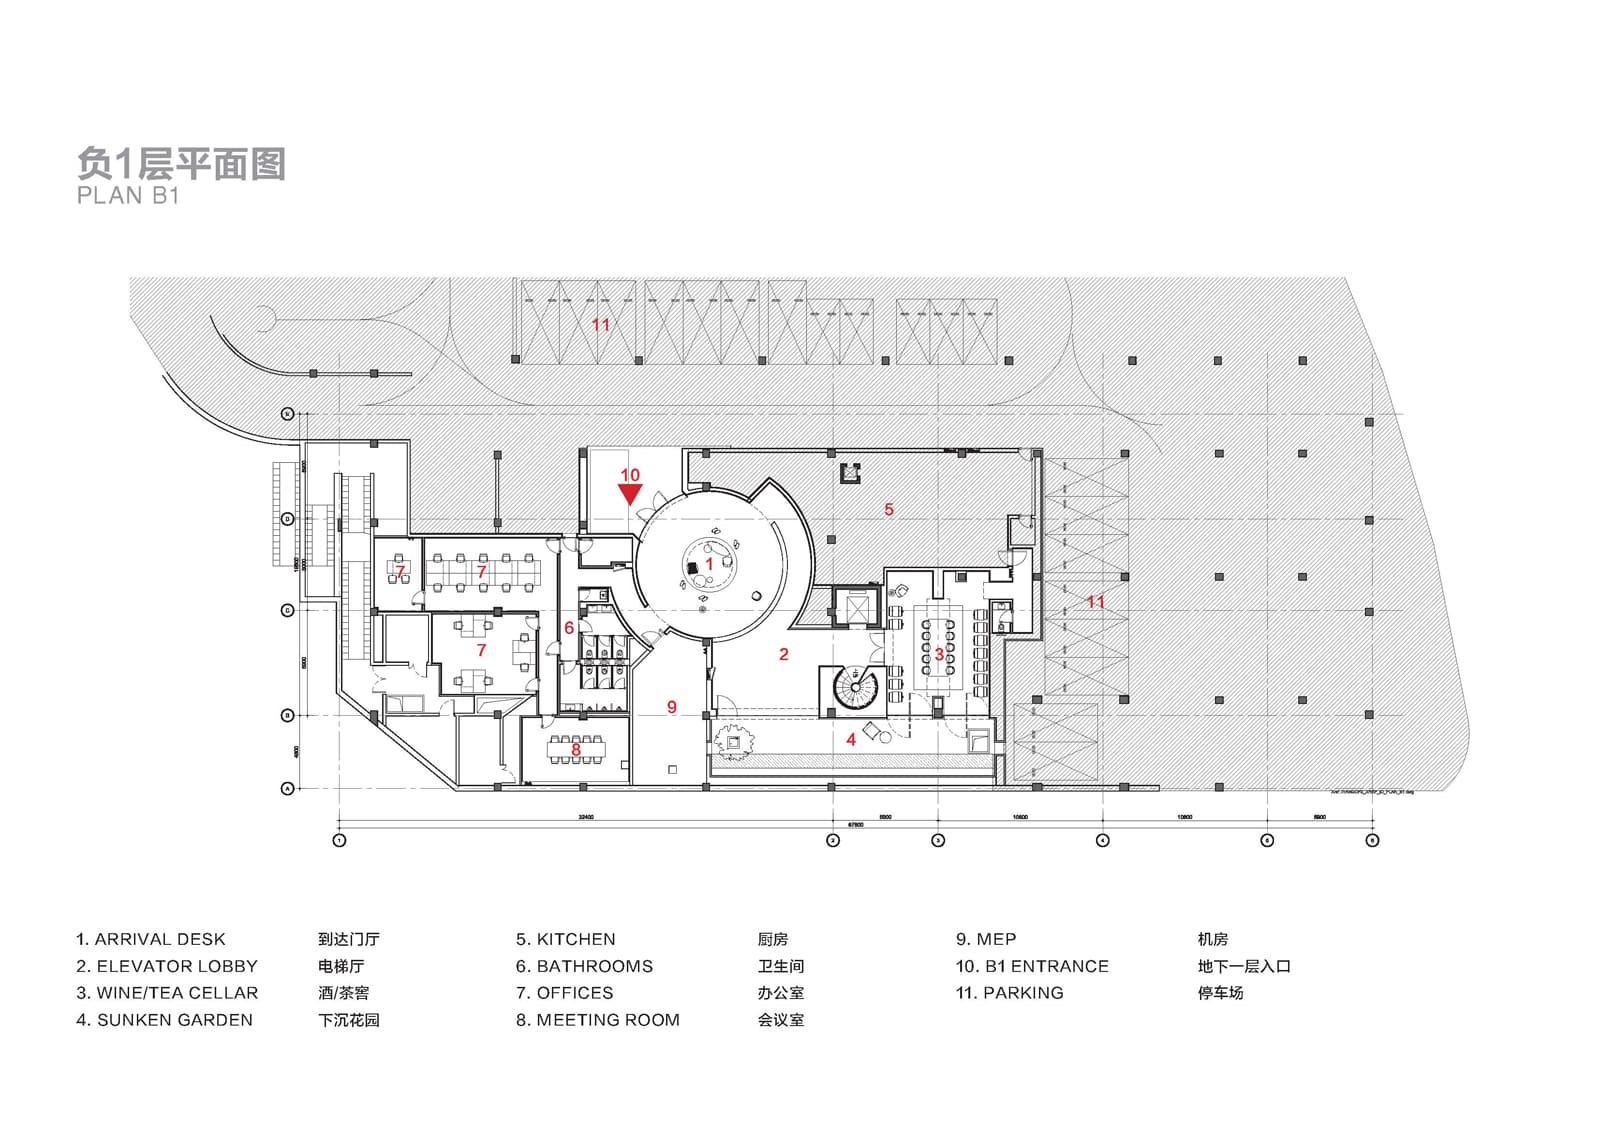 Fuzhou Teahouse  - 20210809 NeriHu FuzhouTeahouse 09.2.1 54